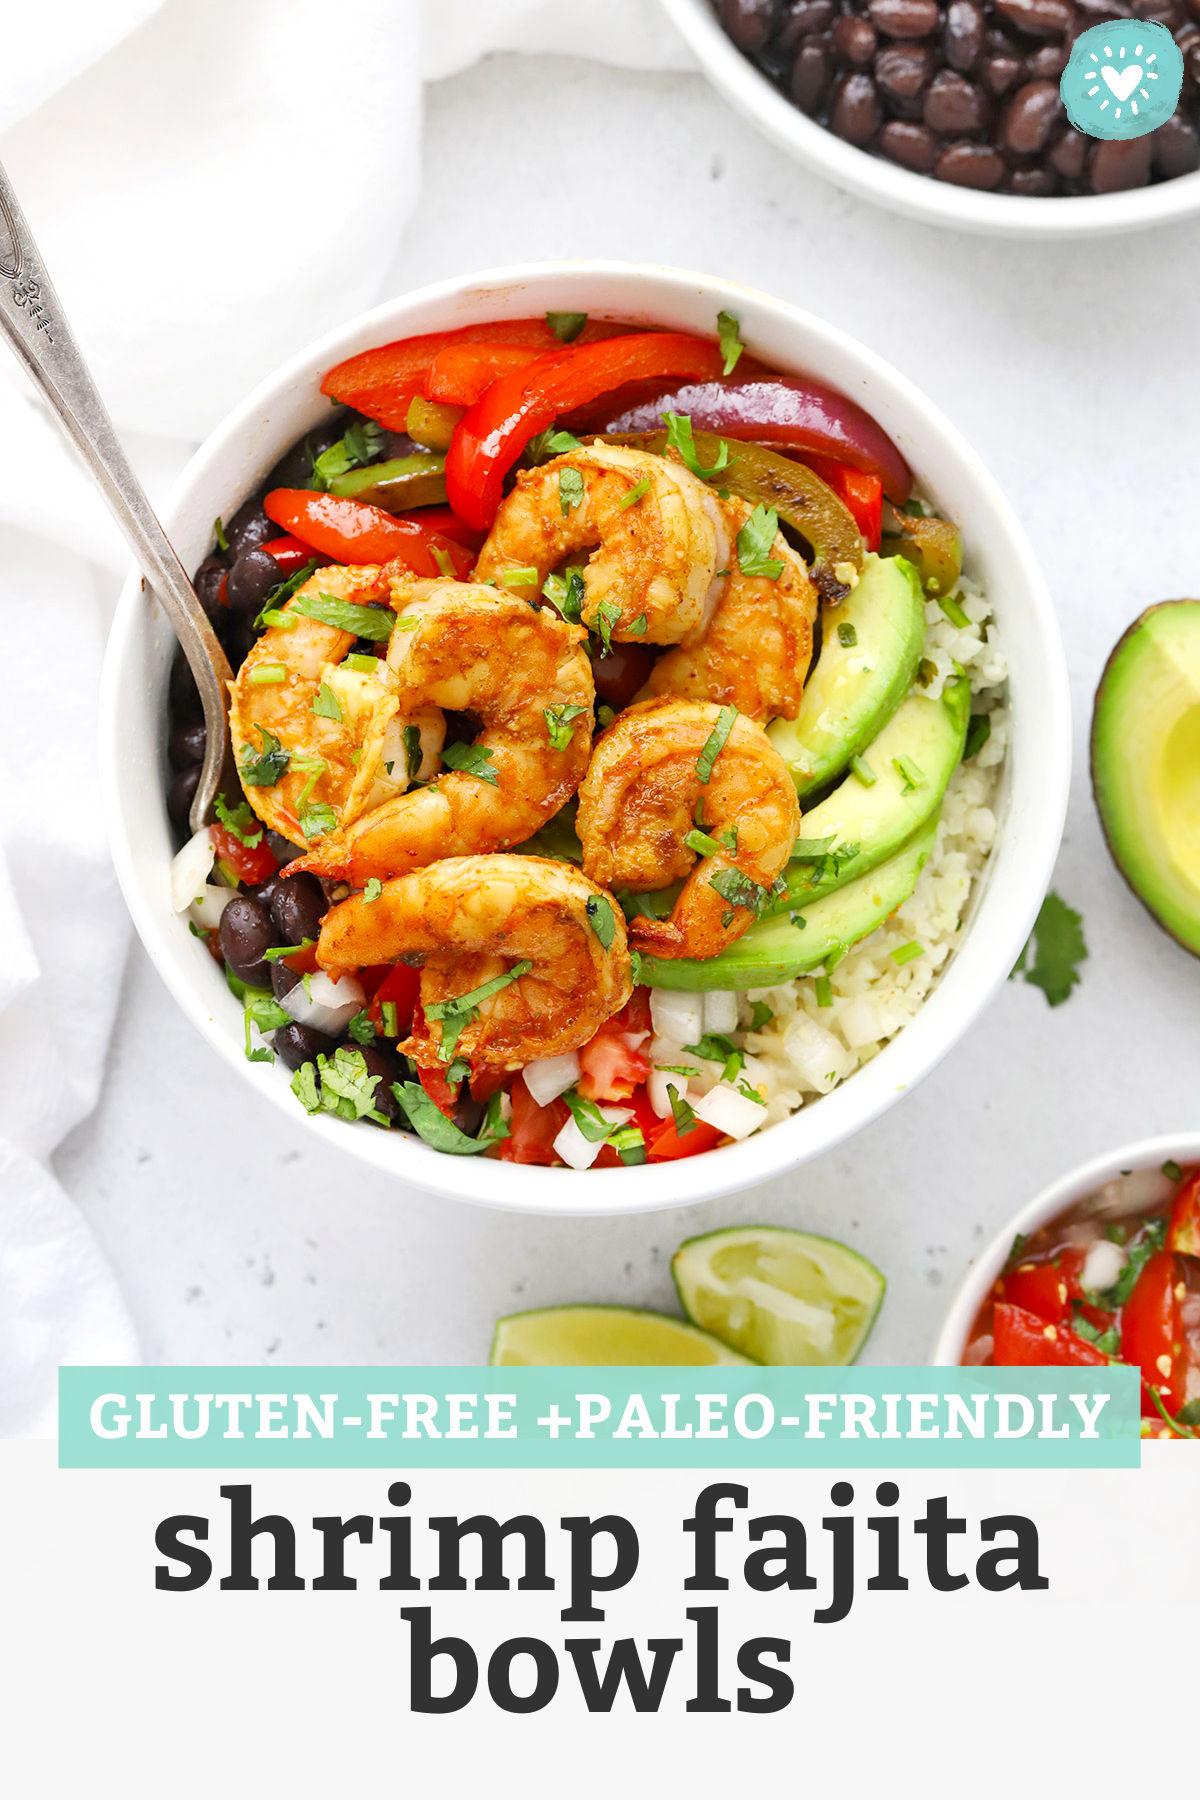 "Overhead view of Gluten Free Shrimp Fajita Bowls with avocado, black beans, and pico de gallo with text overlay that reads ""Gluten-Free + Paleo-Friendly Shrimp Fajita Bowls"""